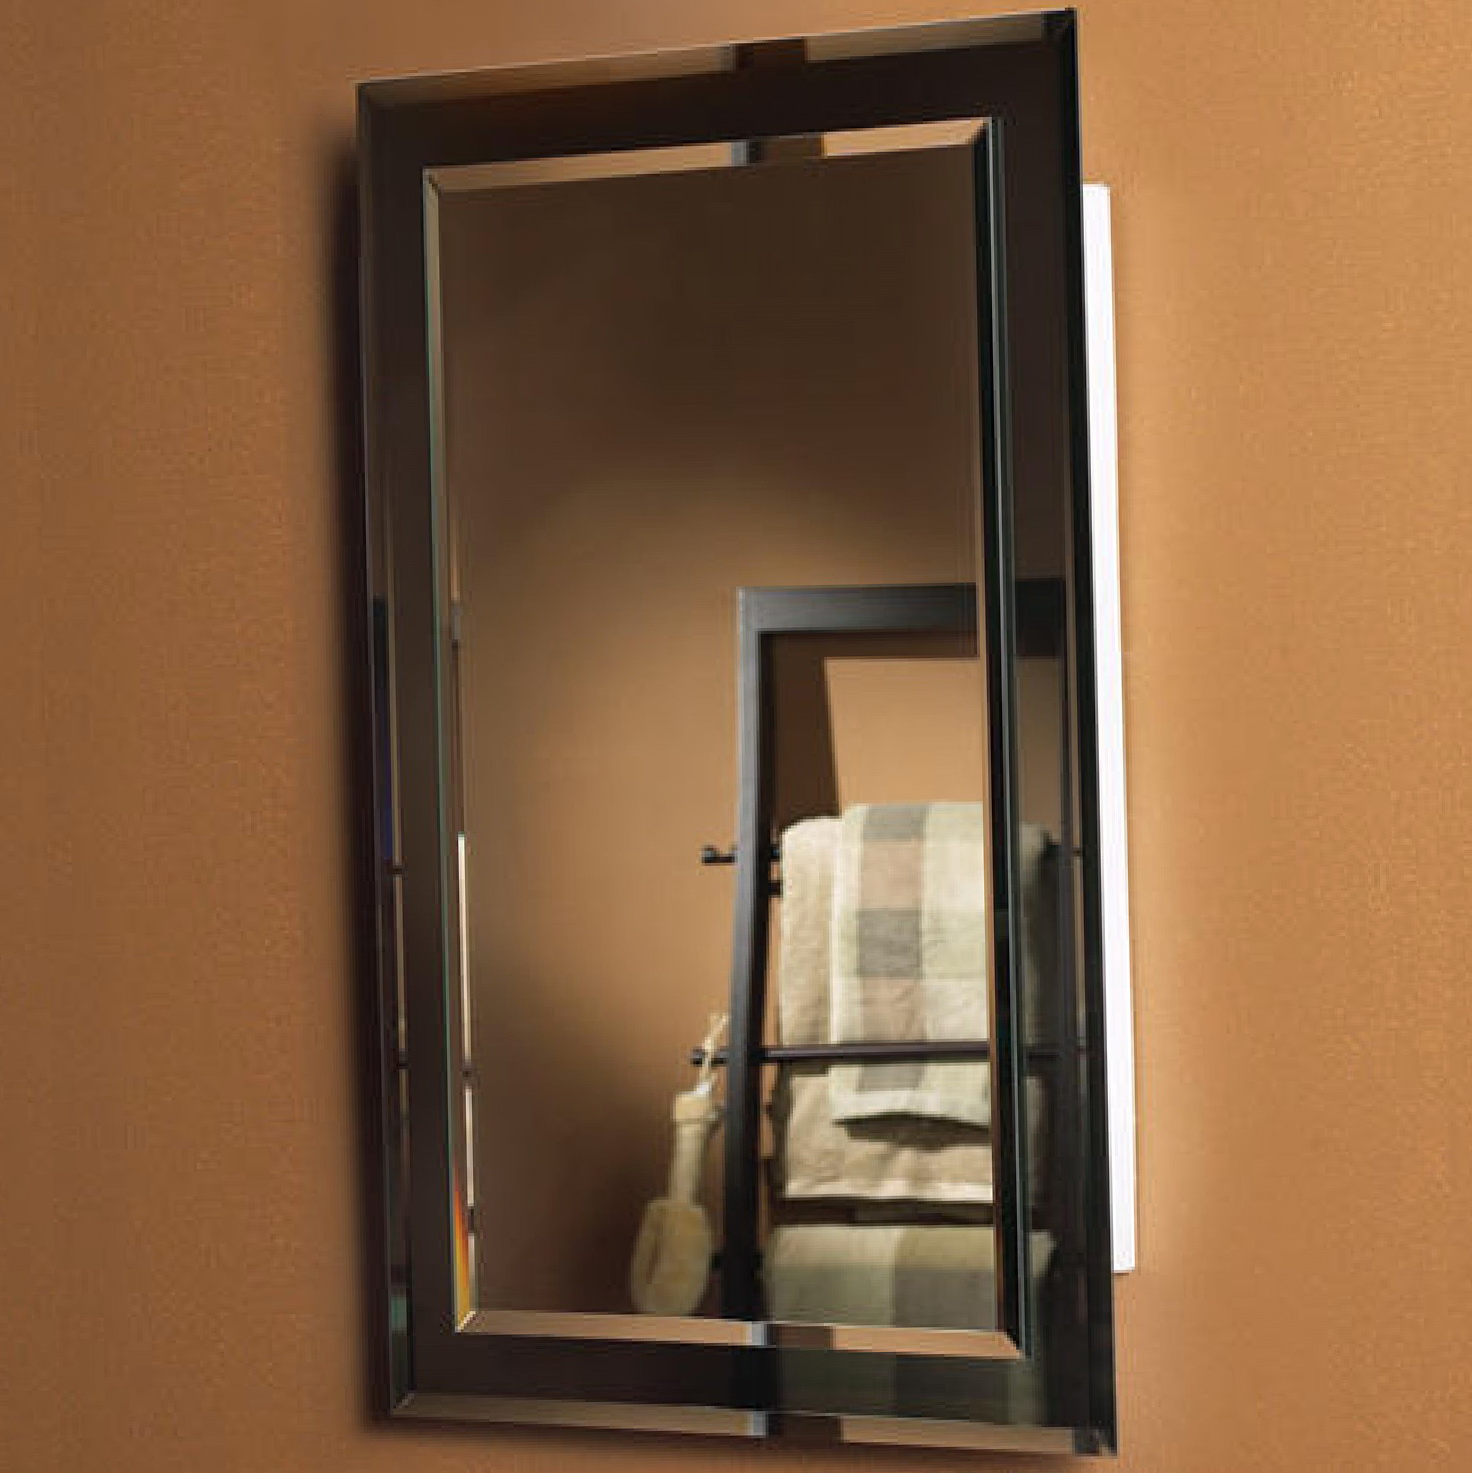 recessed wood medicine cabinet no mirror home design ideas. Black Bedroom Furniture Sets. Home Design Ideas